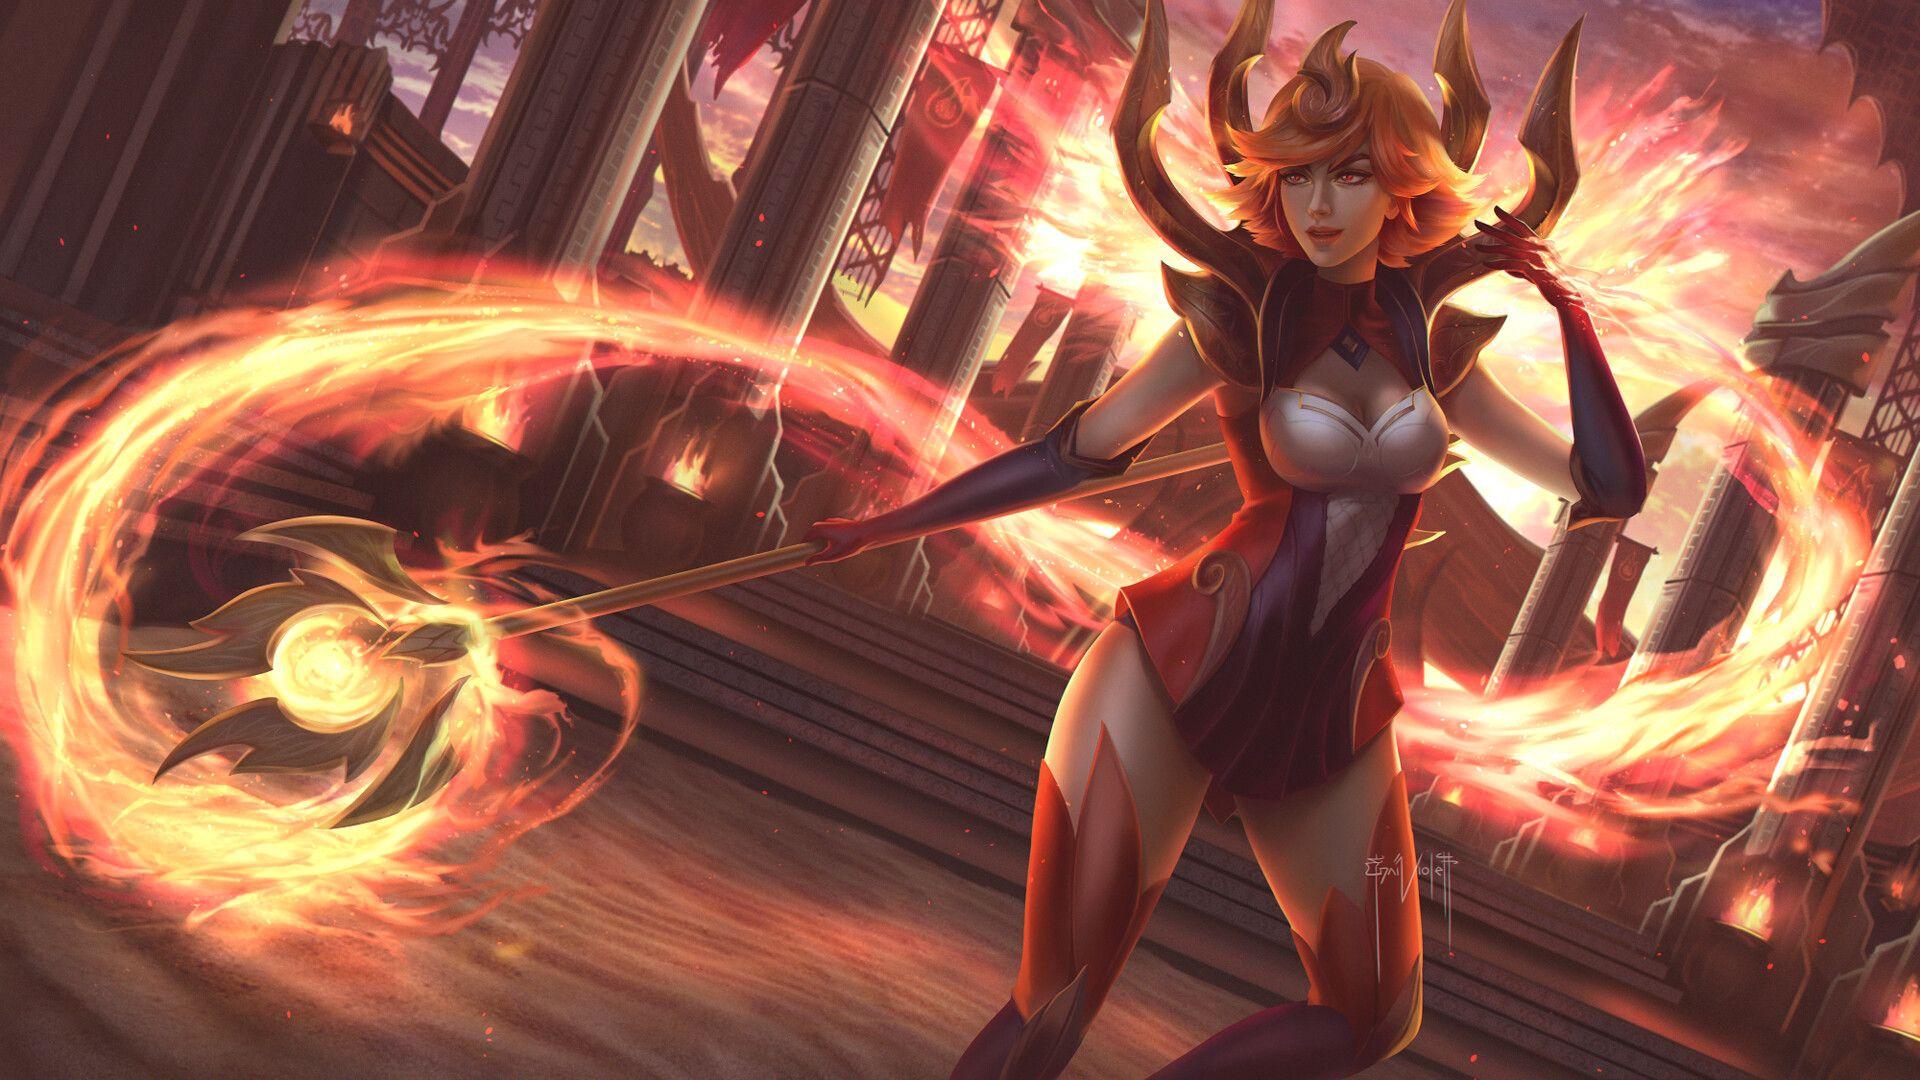 Elementalist Lux Fire Lol League Of Legends League Of Legends Cute Anime Pics